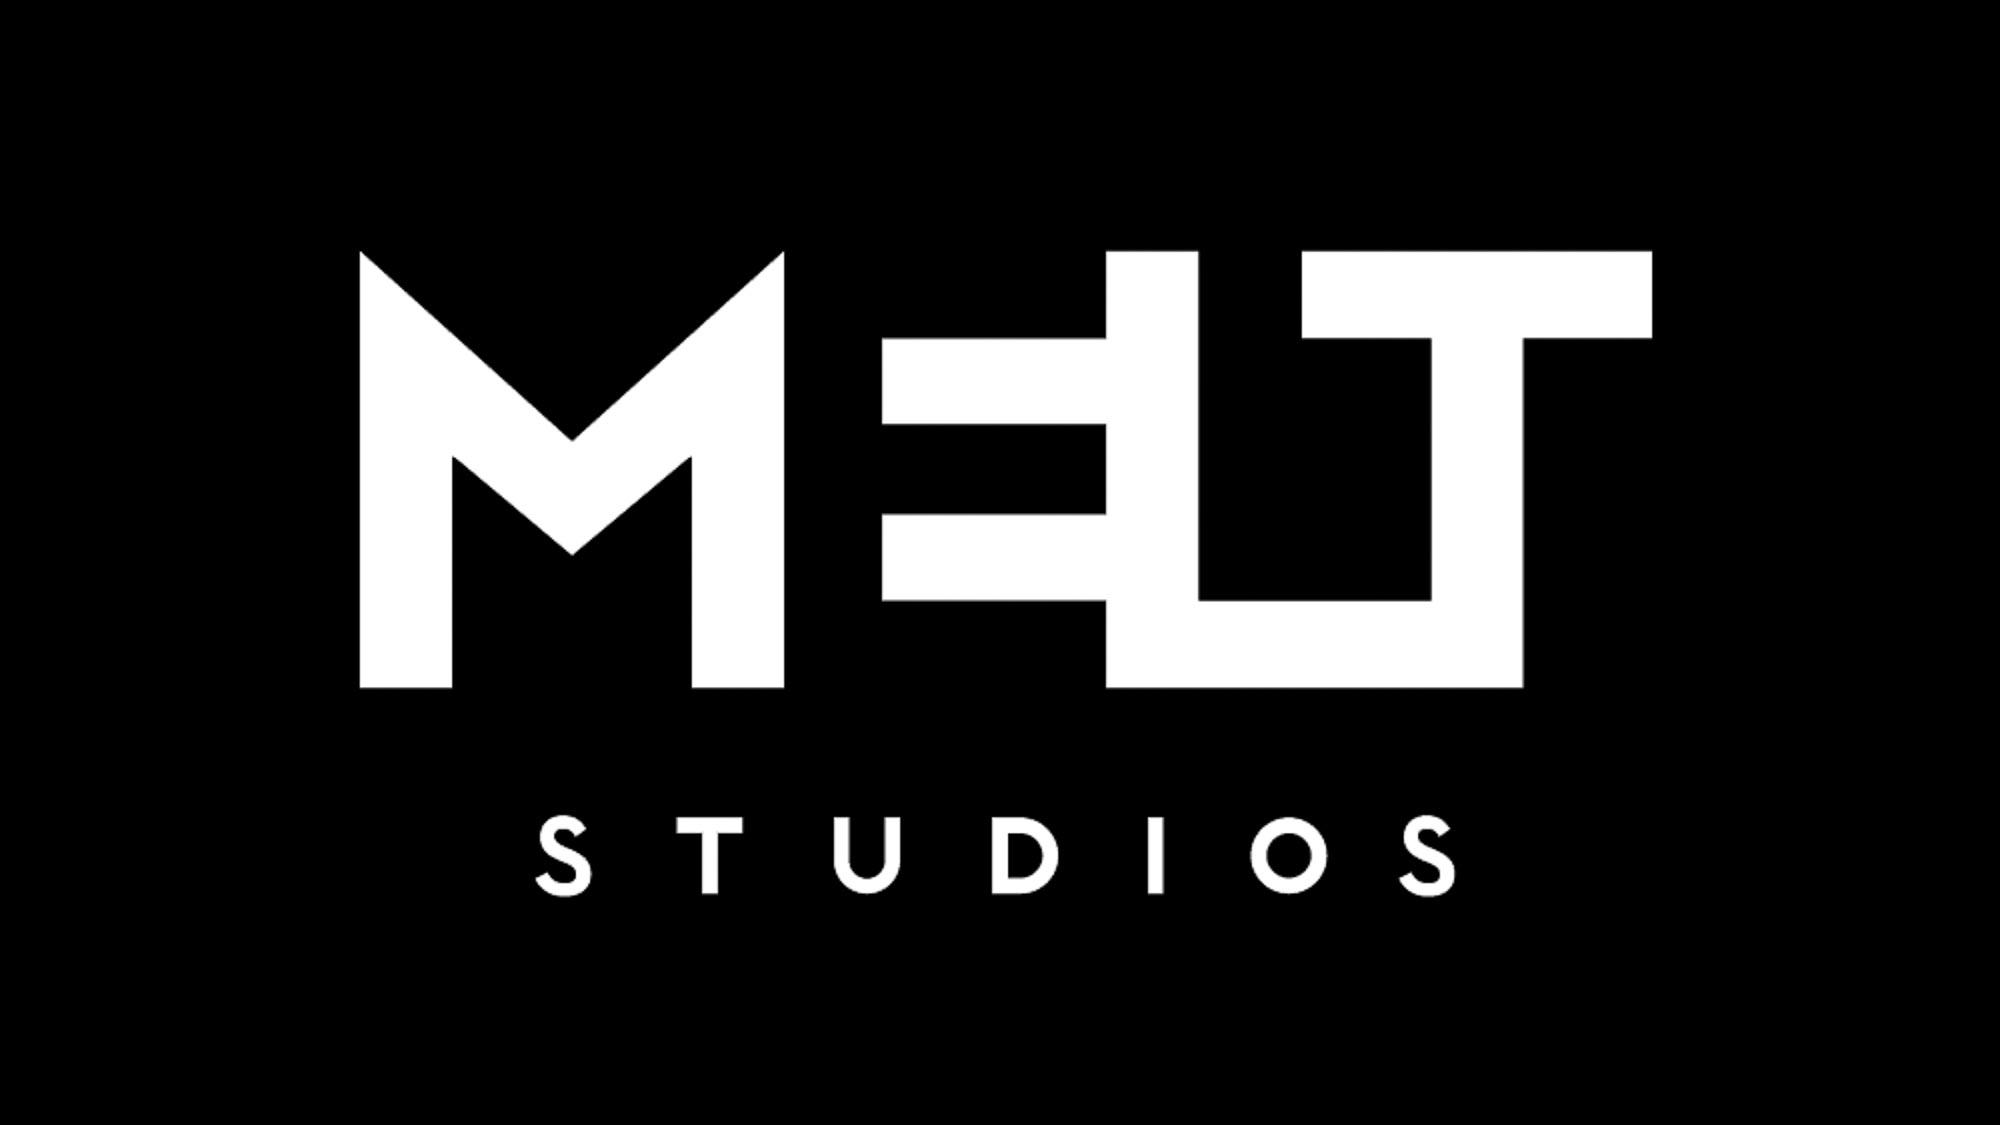 01_170503_MeltStudio_Logo_Brandboard_Black_1000x1000px